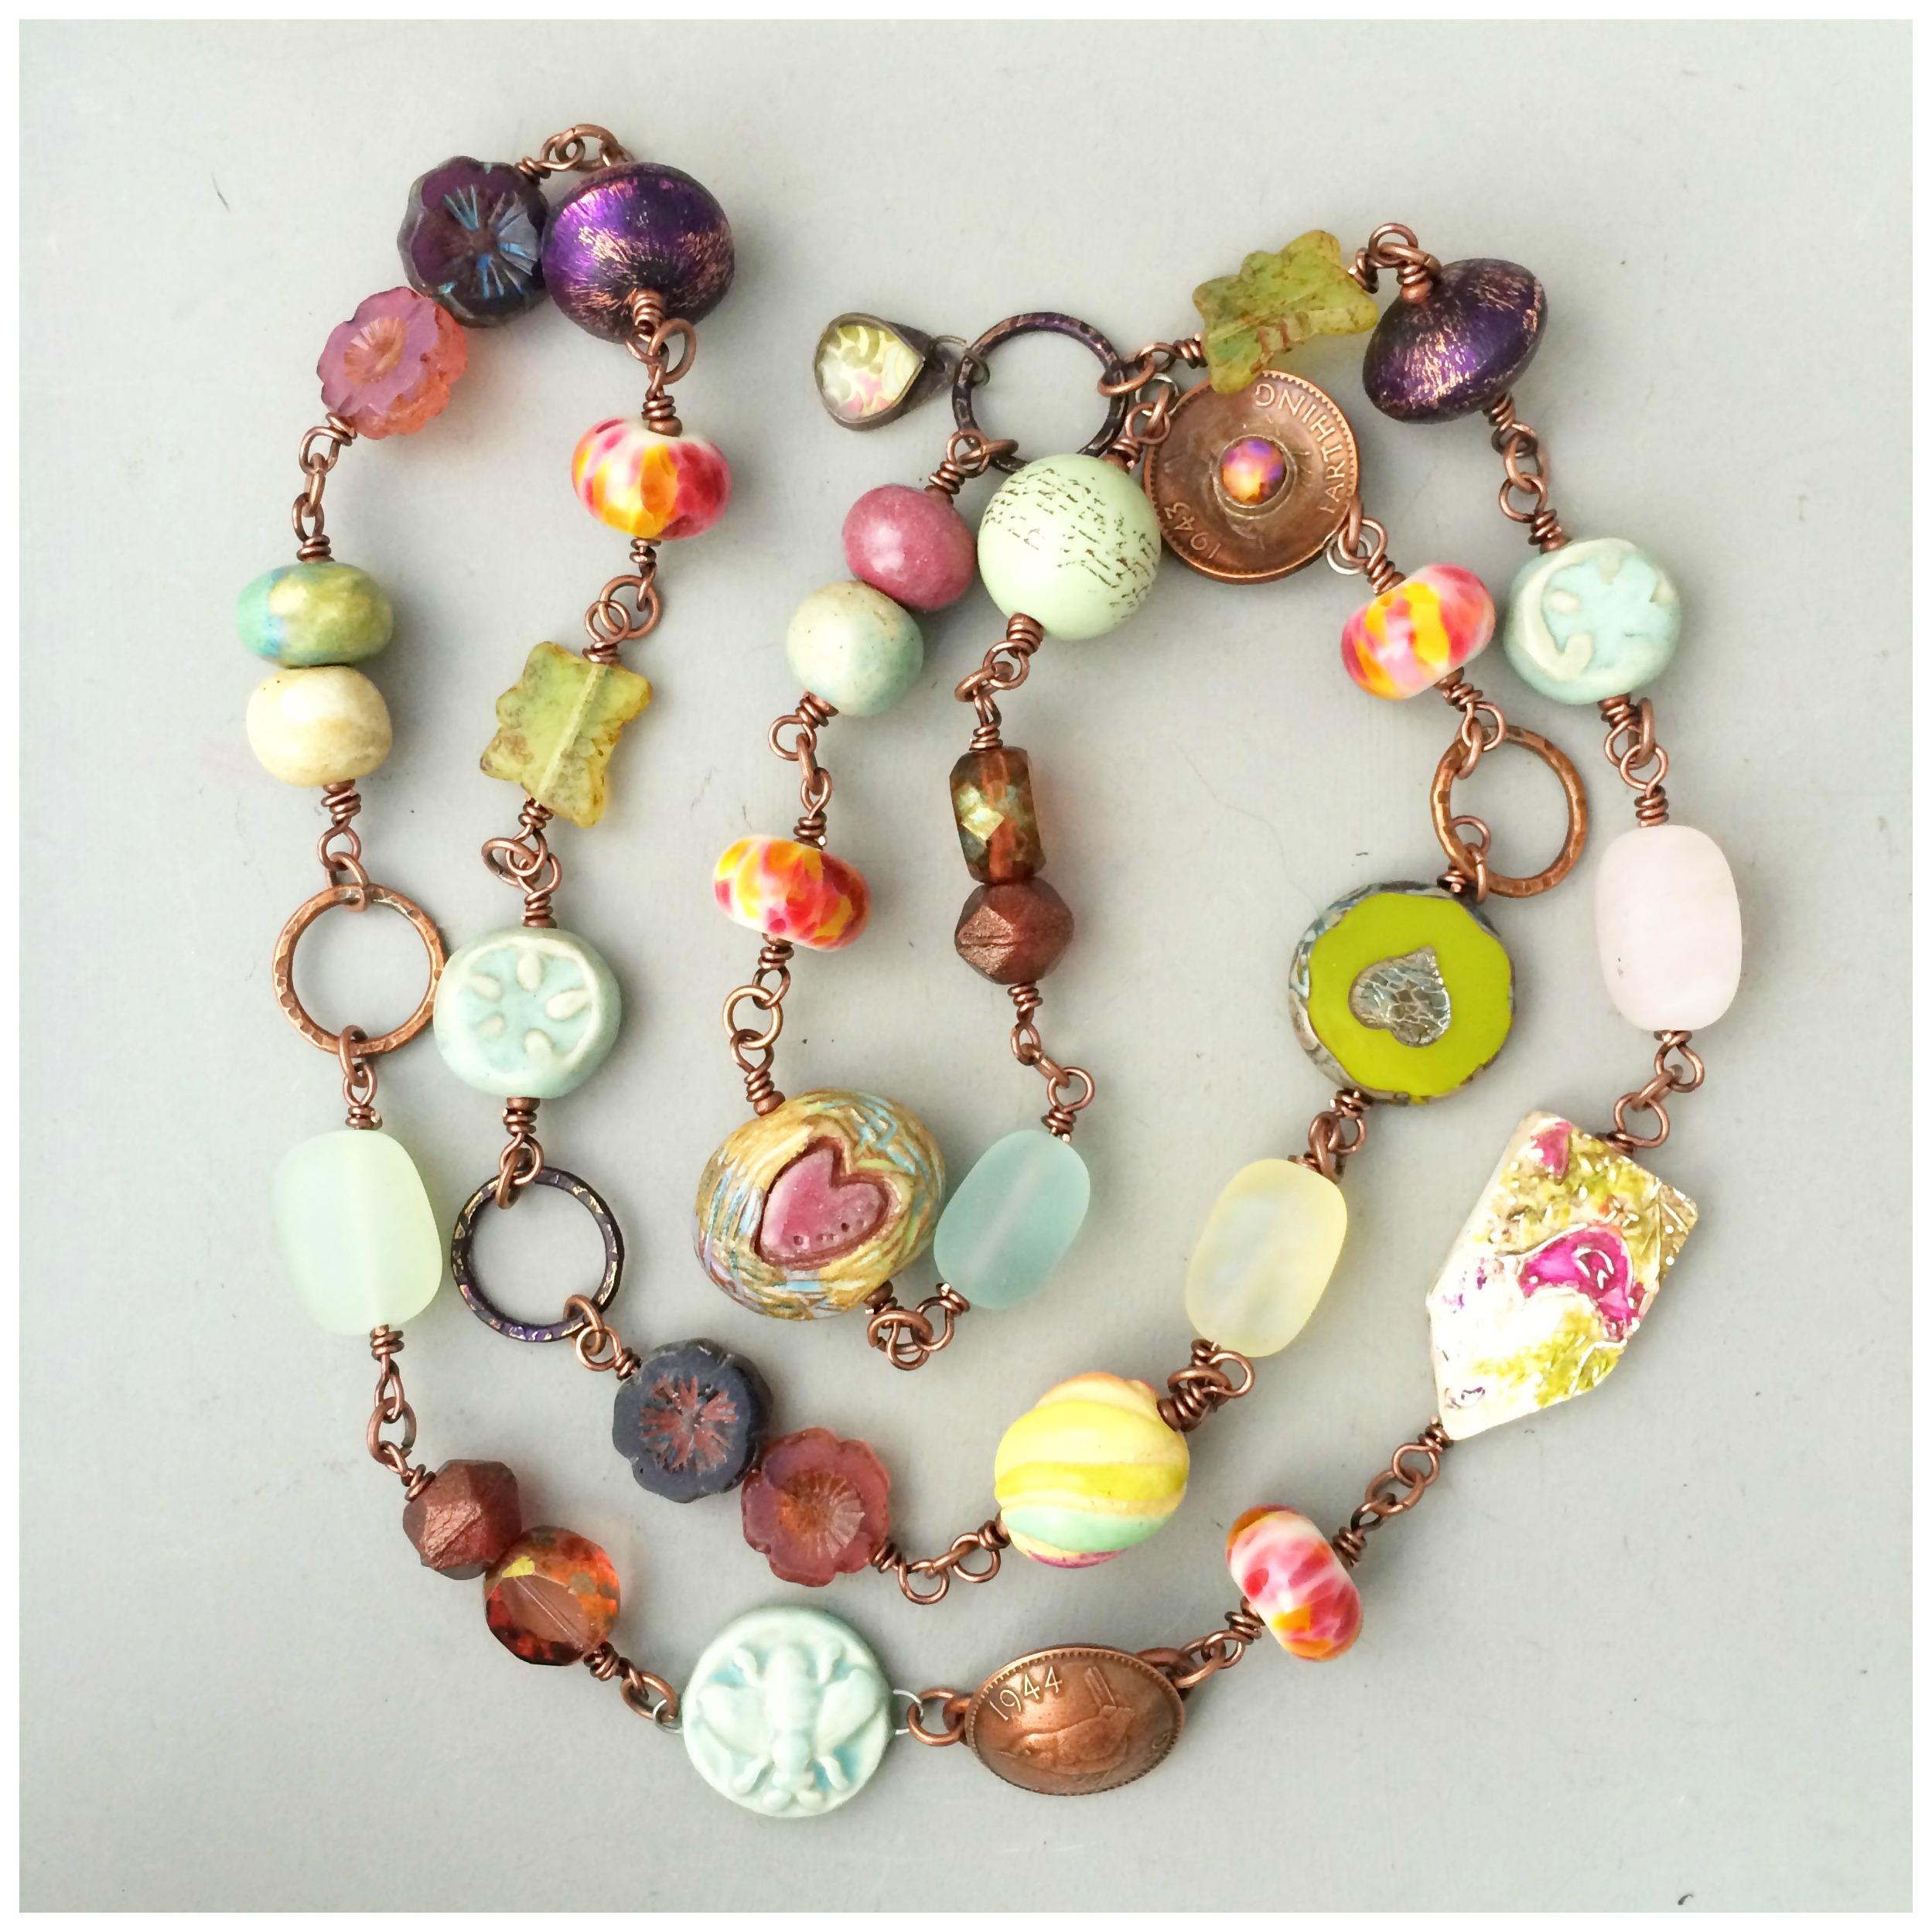 Bowerbird necklace